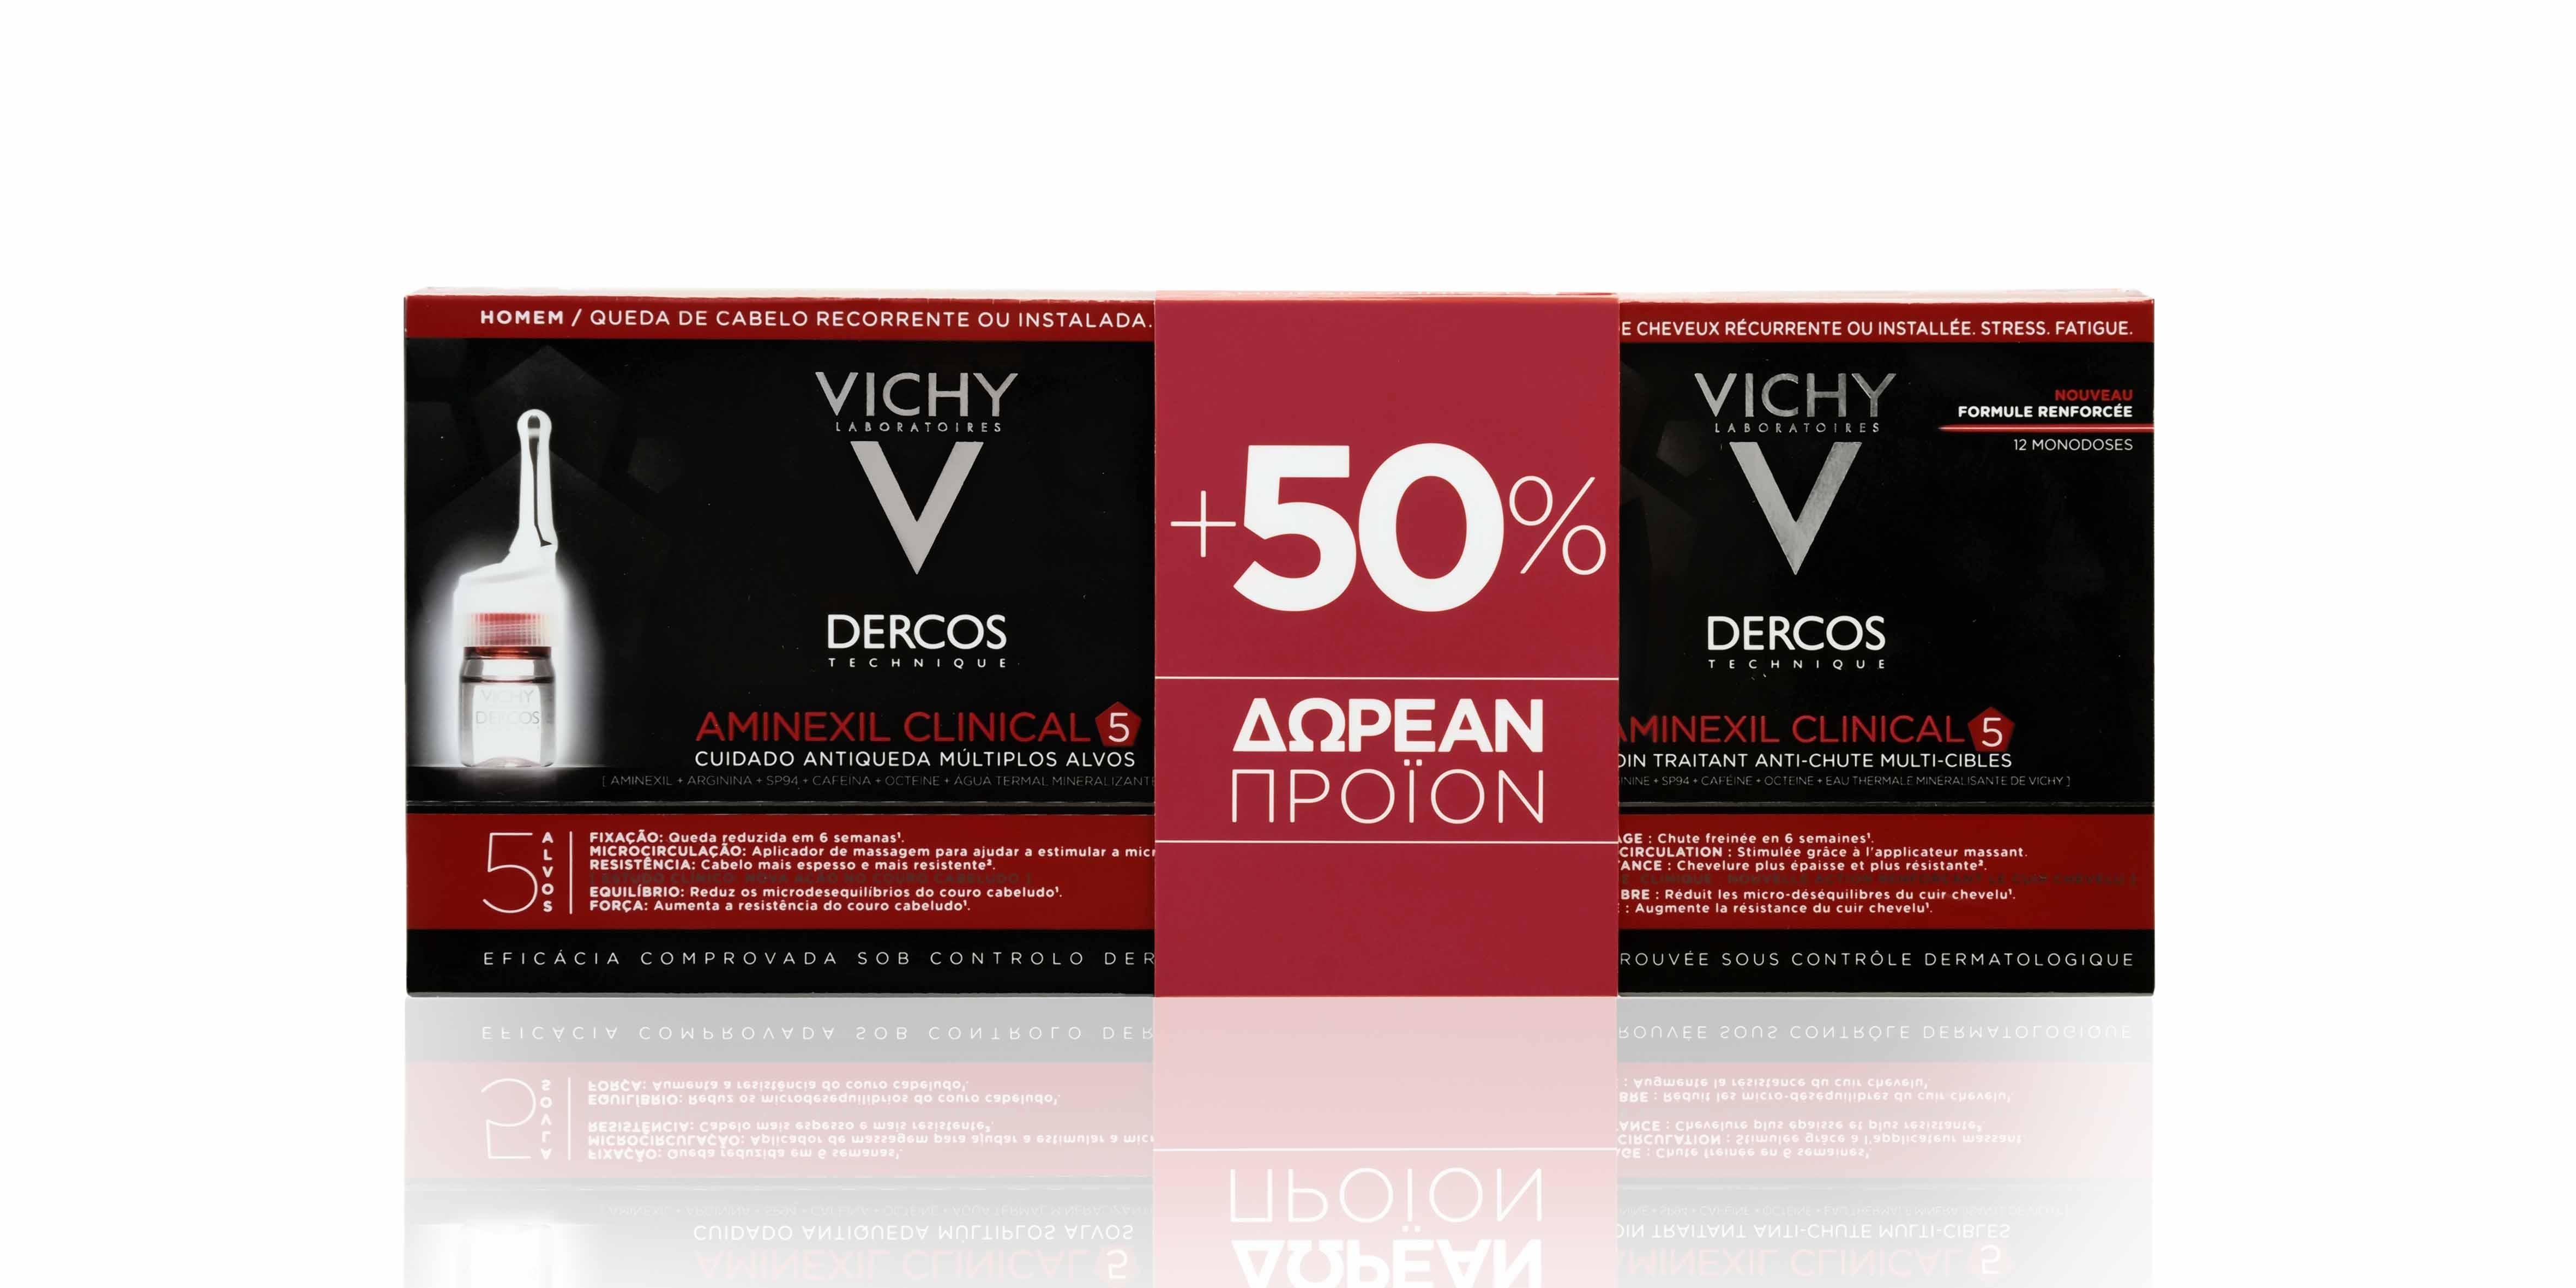 Vichy Dercos Aminexil Clinical 5 PROMO PACK Πρόγραμμα κατά της Τριχόπτωσης Πολλαπλής Στόχευσης, 21 monodoses & ΔΩΡΟ 12 ΕΠΙΠΛΕΟΝ monodoses